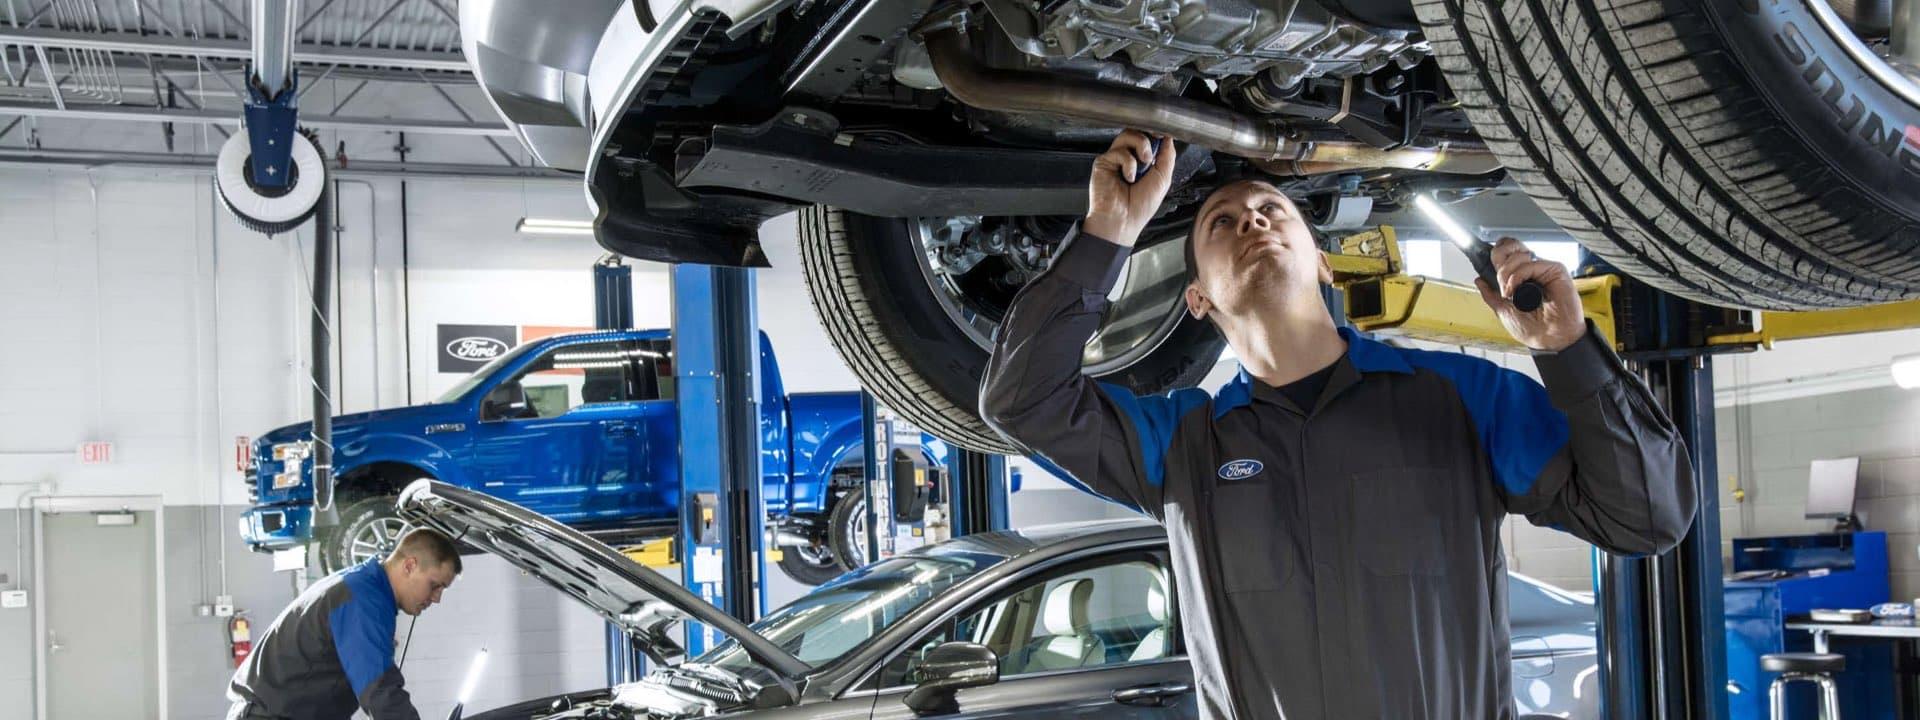 Technician looking at underside of car